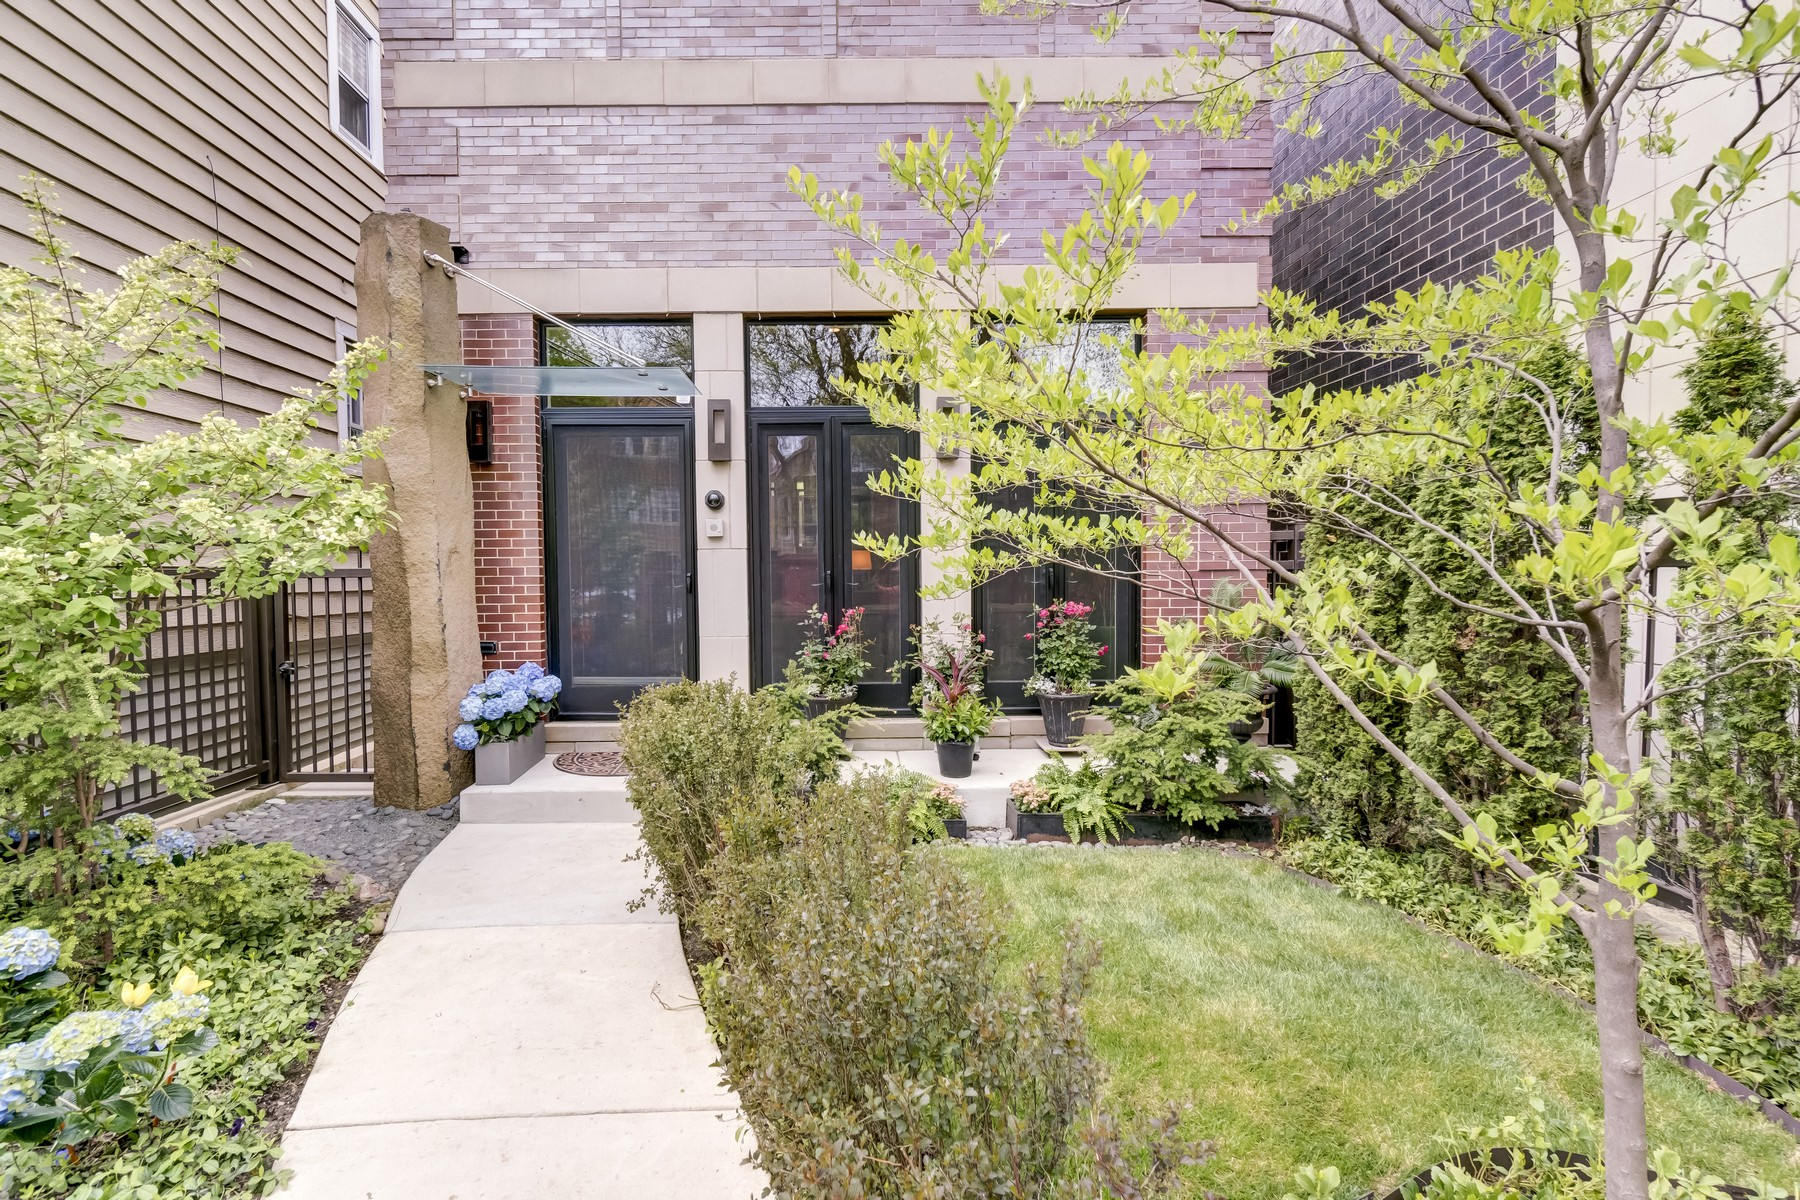 Casa para uma família para Venda às Stunning Brick and Limestone Residence 2654 N Marshfield Avenue Chicago, Illinois, 60614 Estados Unidos